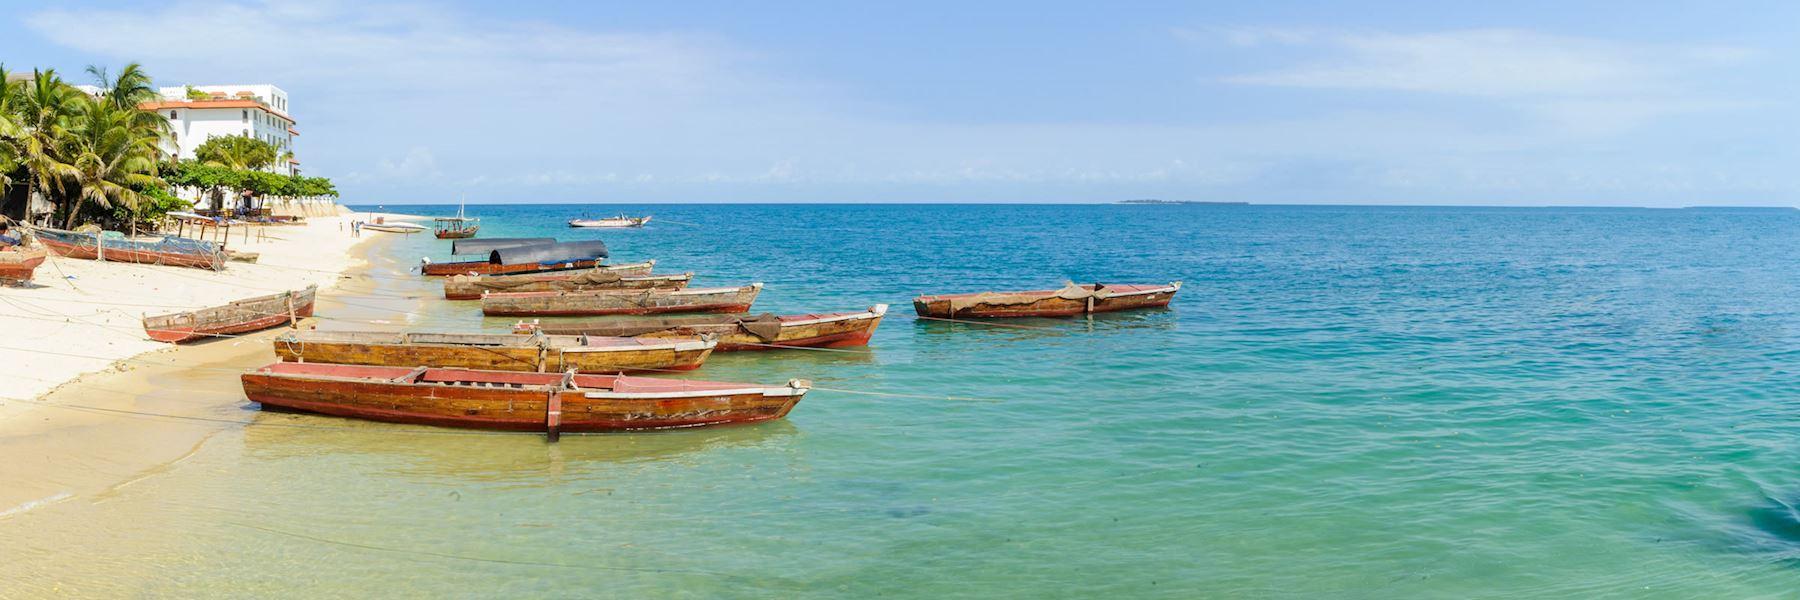 Visit Tanzania's Swahili Coast, Tanzania